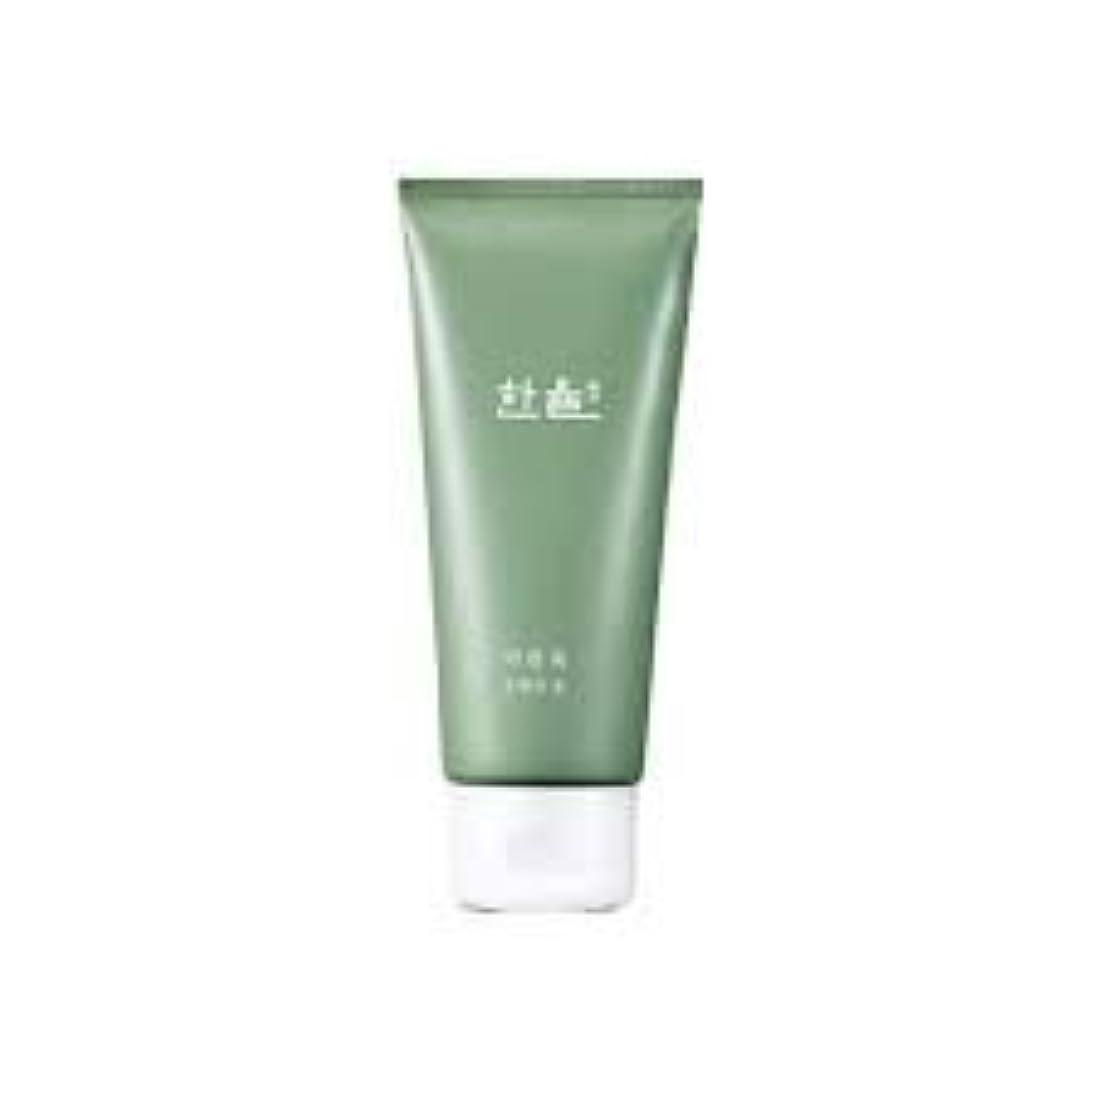 特権壁紙愛人Hanyul Pure Artemisia Cleansing Foam 6.1 Ounce [並行輸入品]